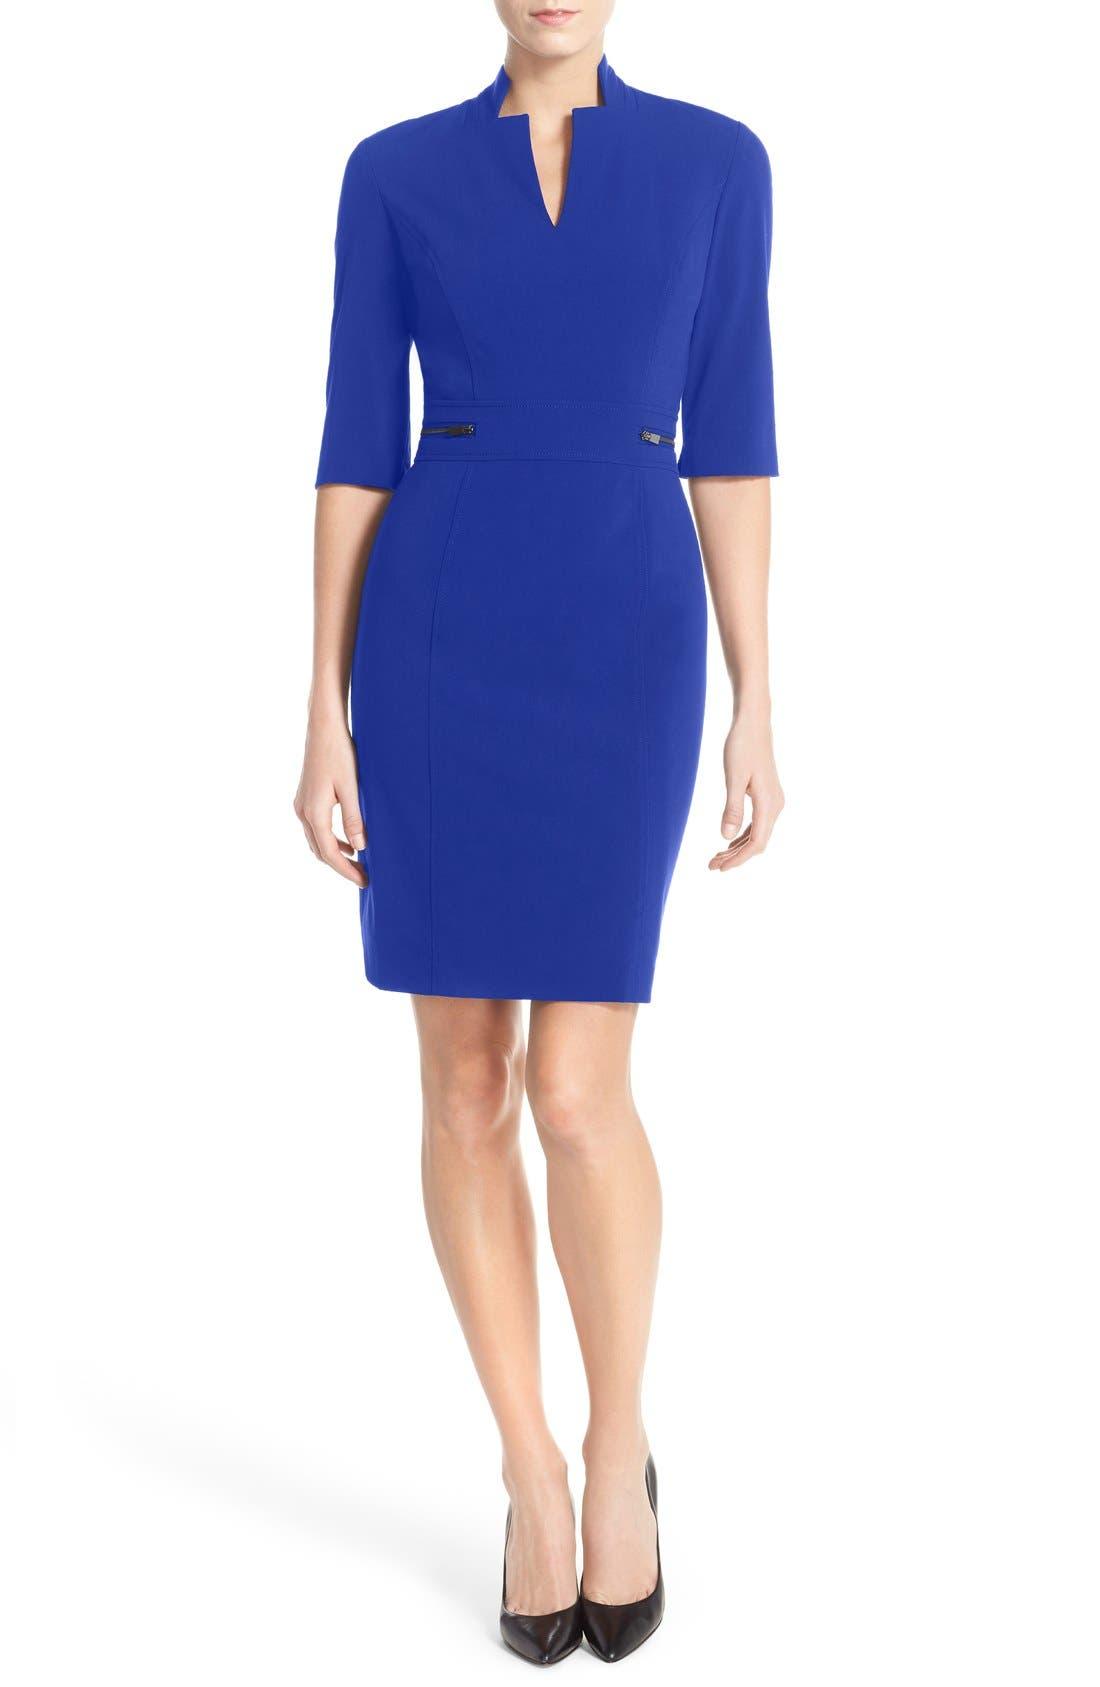 Alternate Image 1 Selected - TahariBi-Stretch Sheath Dress (Regular & Petite)